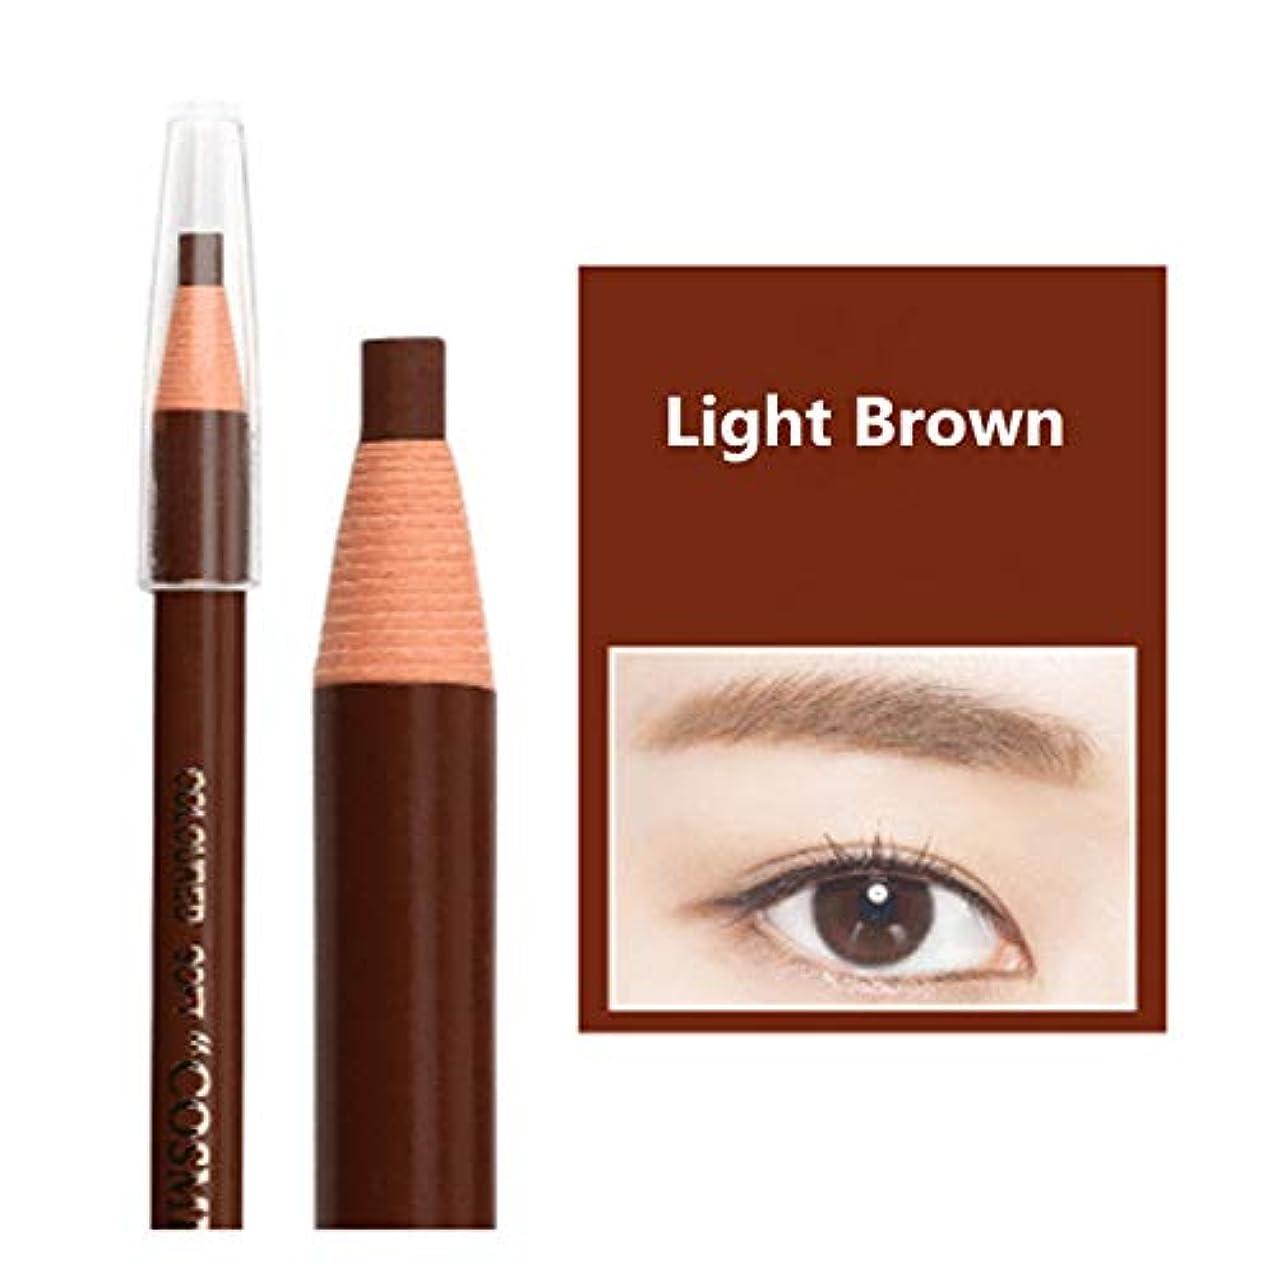 Quality 12Pcs/ Lot 5 Colors Real Top Long-Lasting Full Cosmetic Art Eyebrow Pencil By Light Brown Pencil qkgjnpzgipymn357